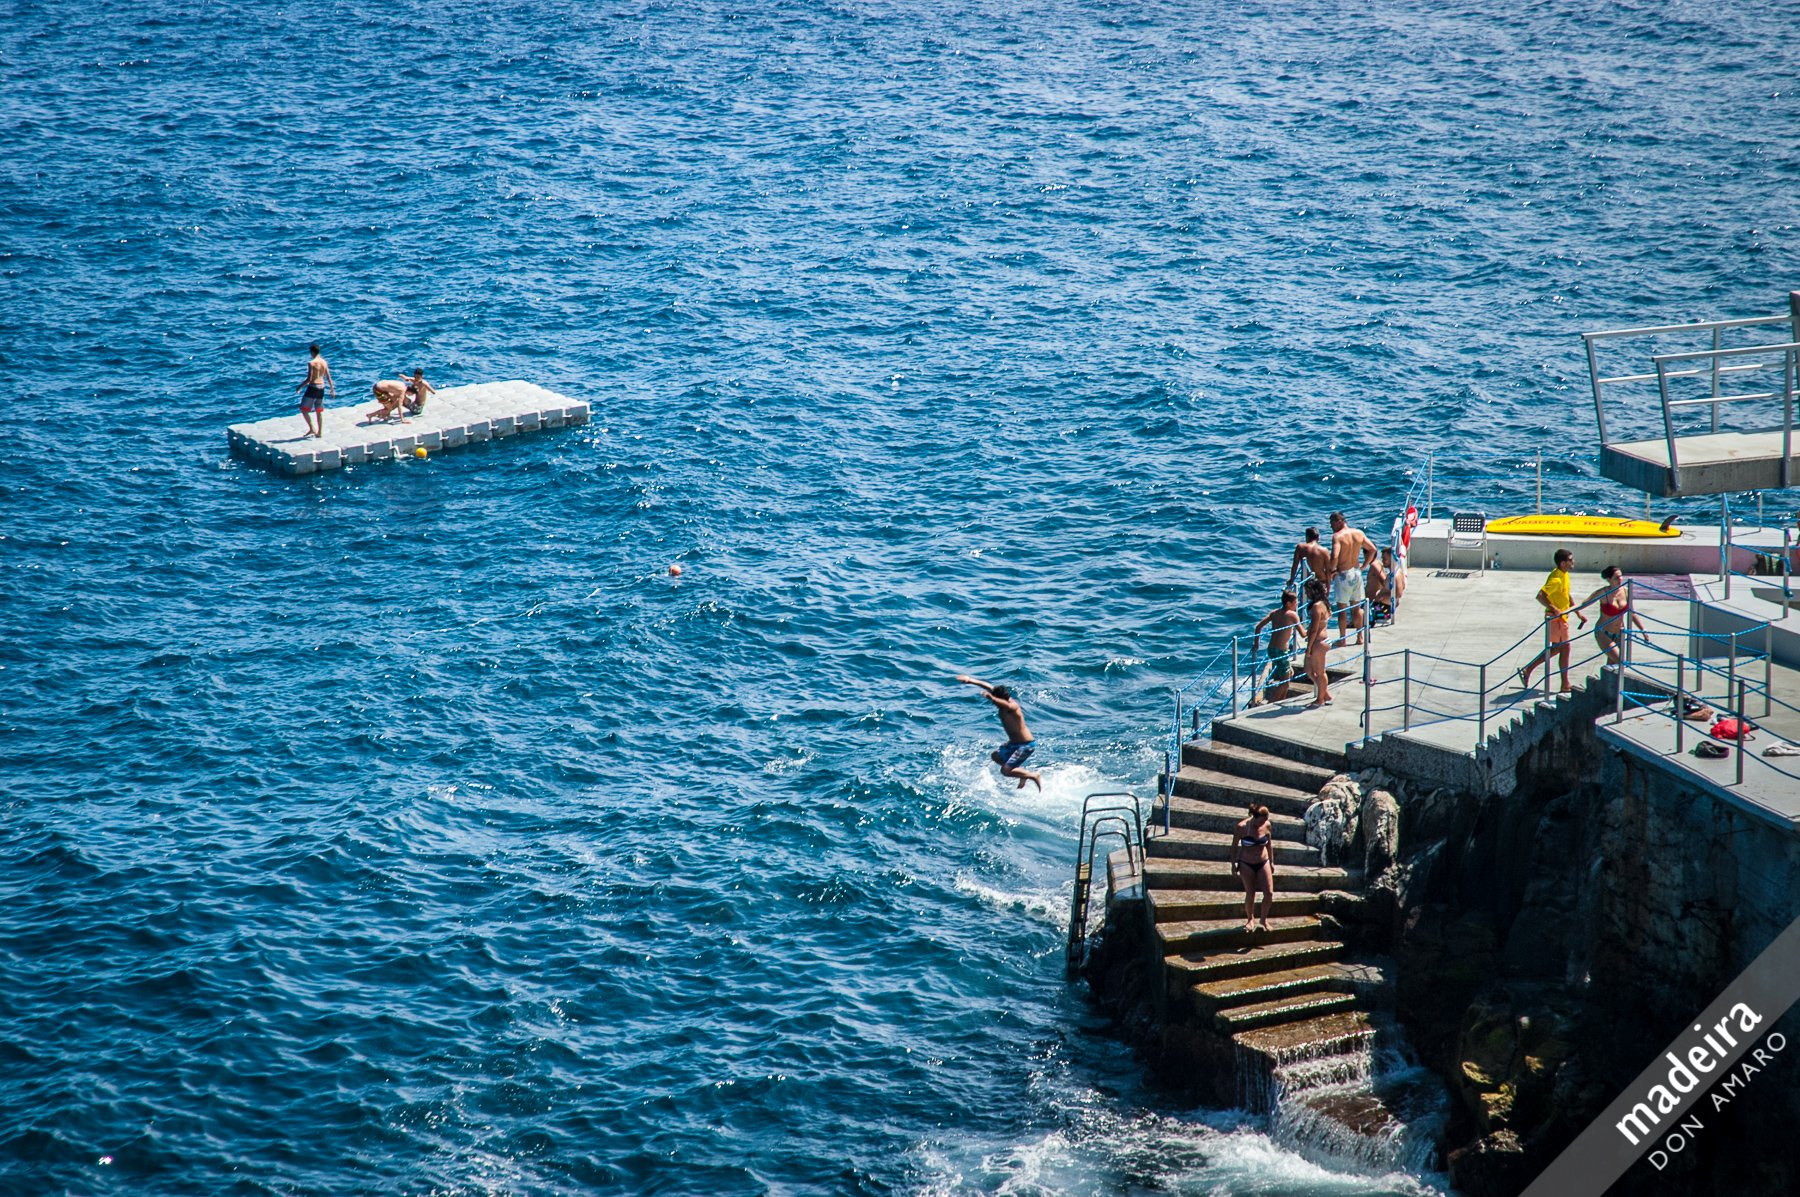 The Lido swimming pool complex is restoring its popularity.  #sharingmadeira #madeiraful https://t.co/cx9KlfjTdC